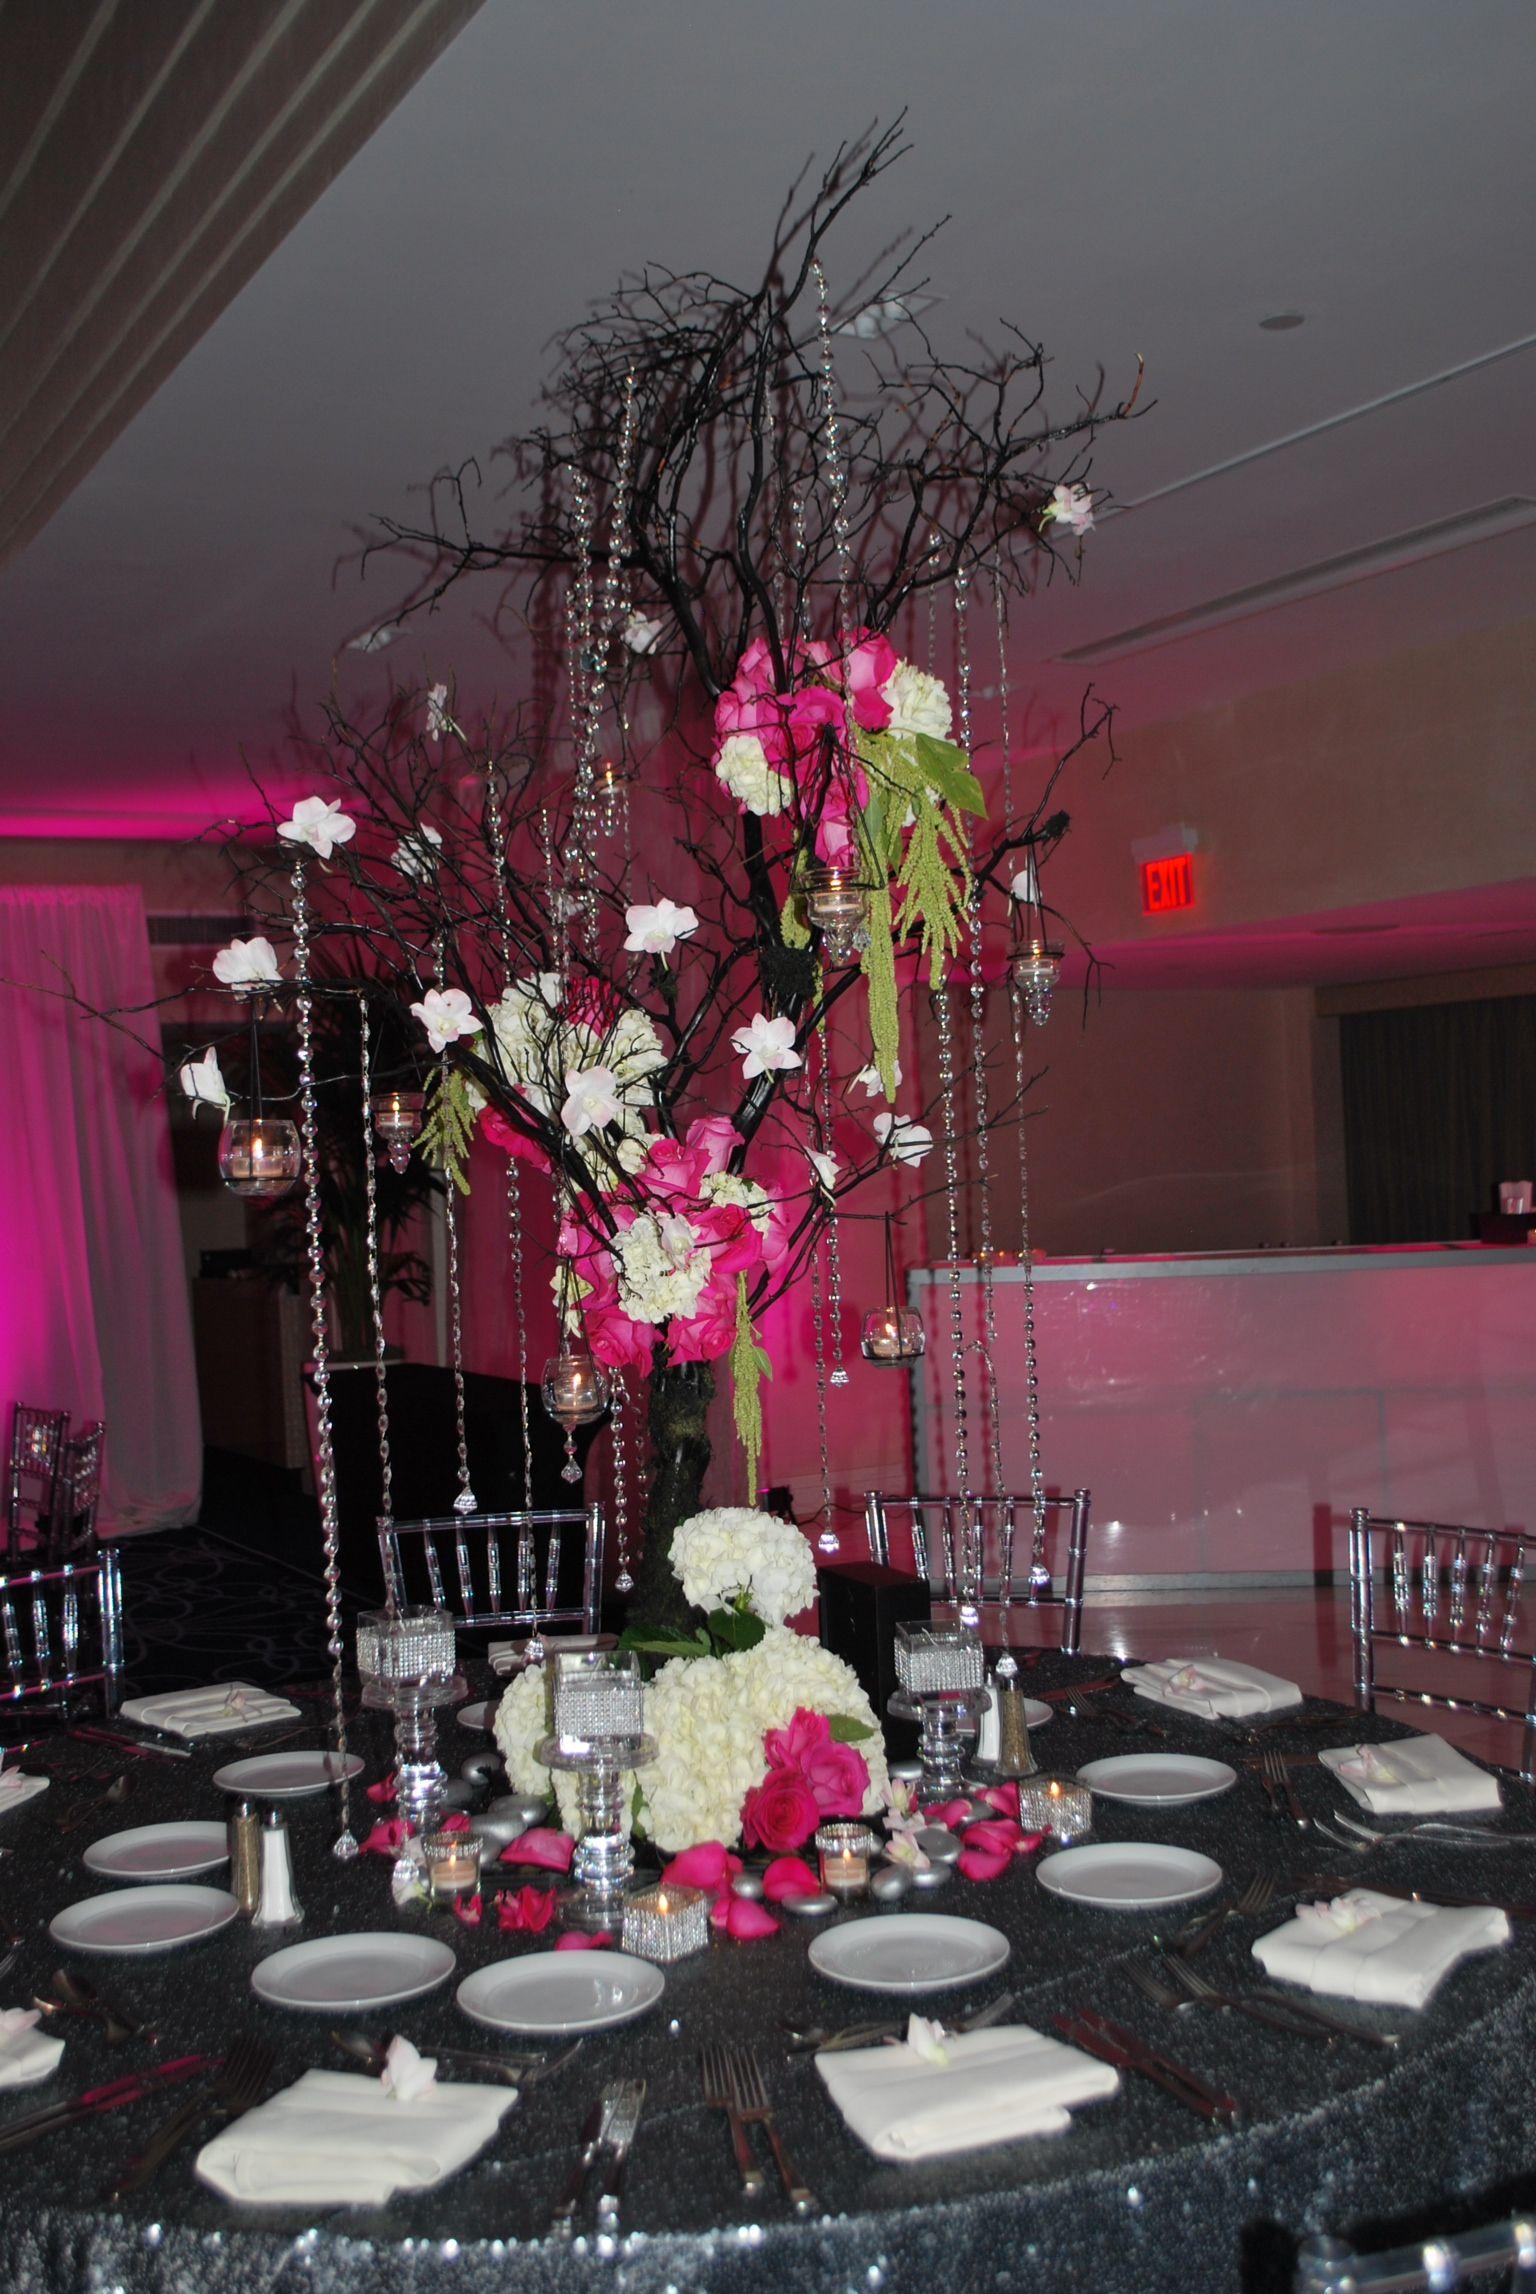 Bat Mitzvah Event Decor Hot Pink Black Silver Color Scheme Manzanita Tree Centerpieces With Flowers Crystals Party Perfect Boca Raton Fl 1 561 994